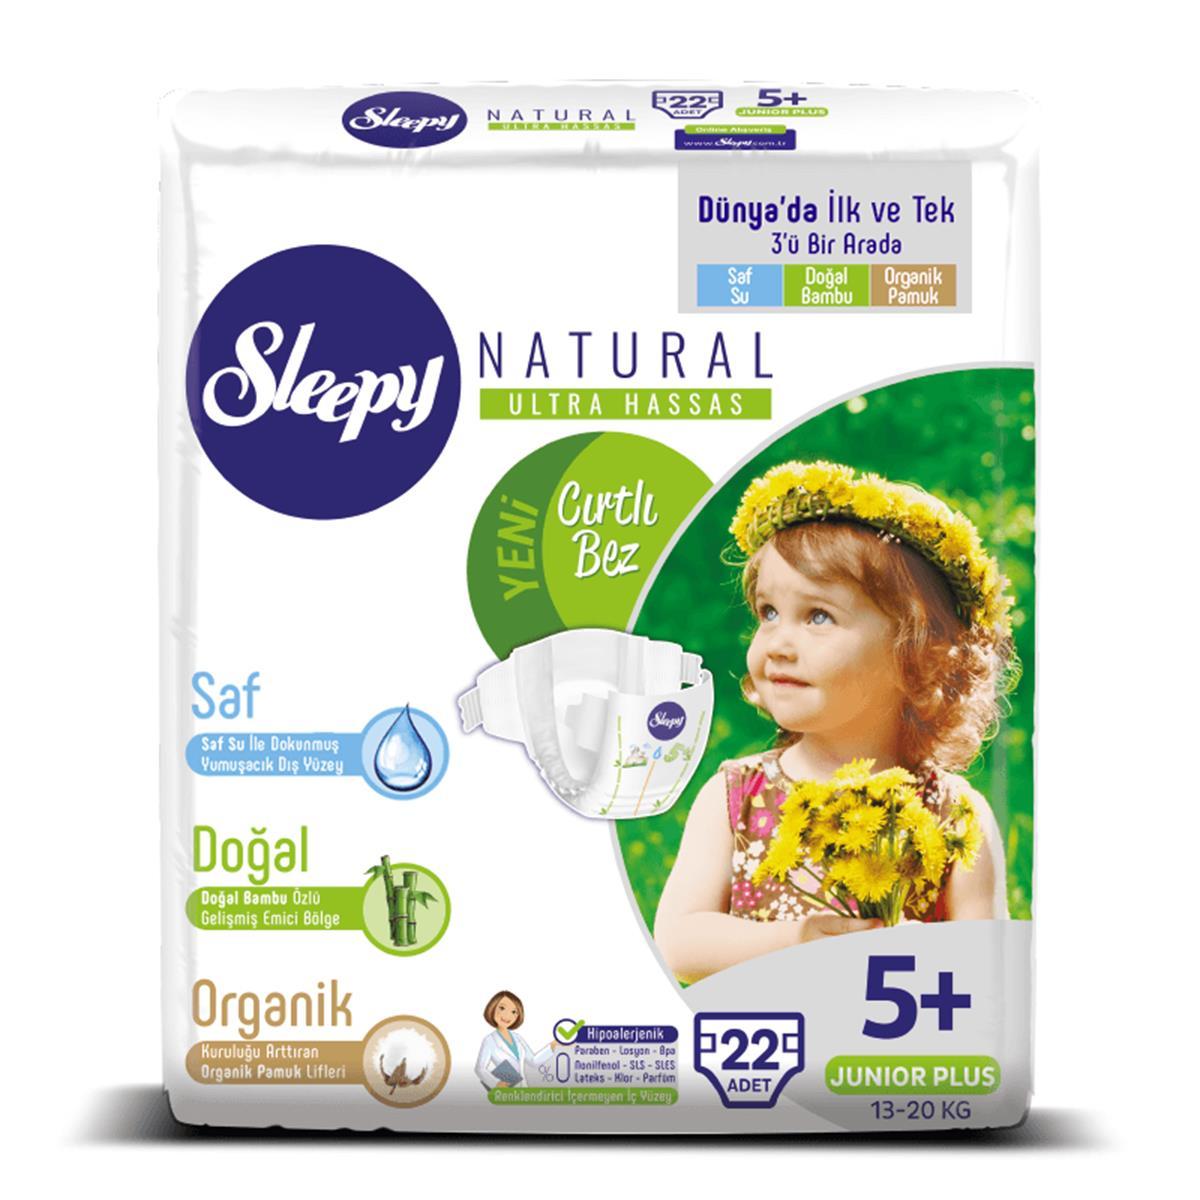 Sleepy Natural Bebek Bezi 5+ Numara 13-20 Kg Junior Plus 22 Adet